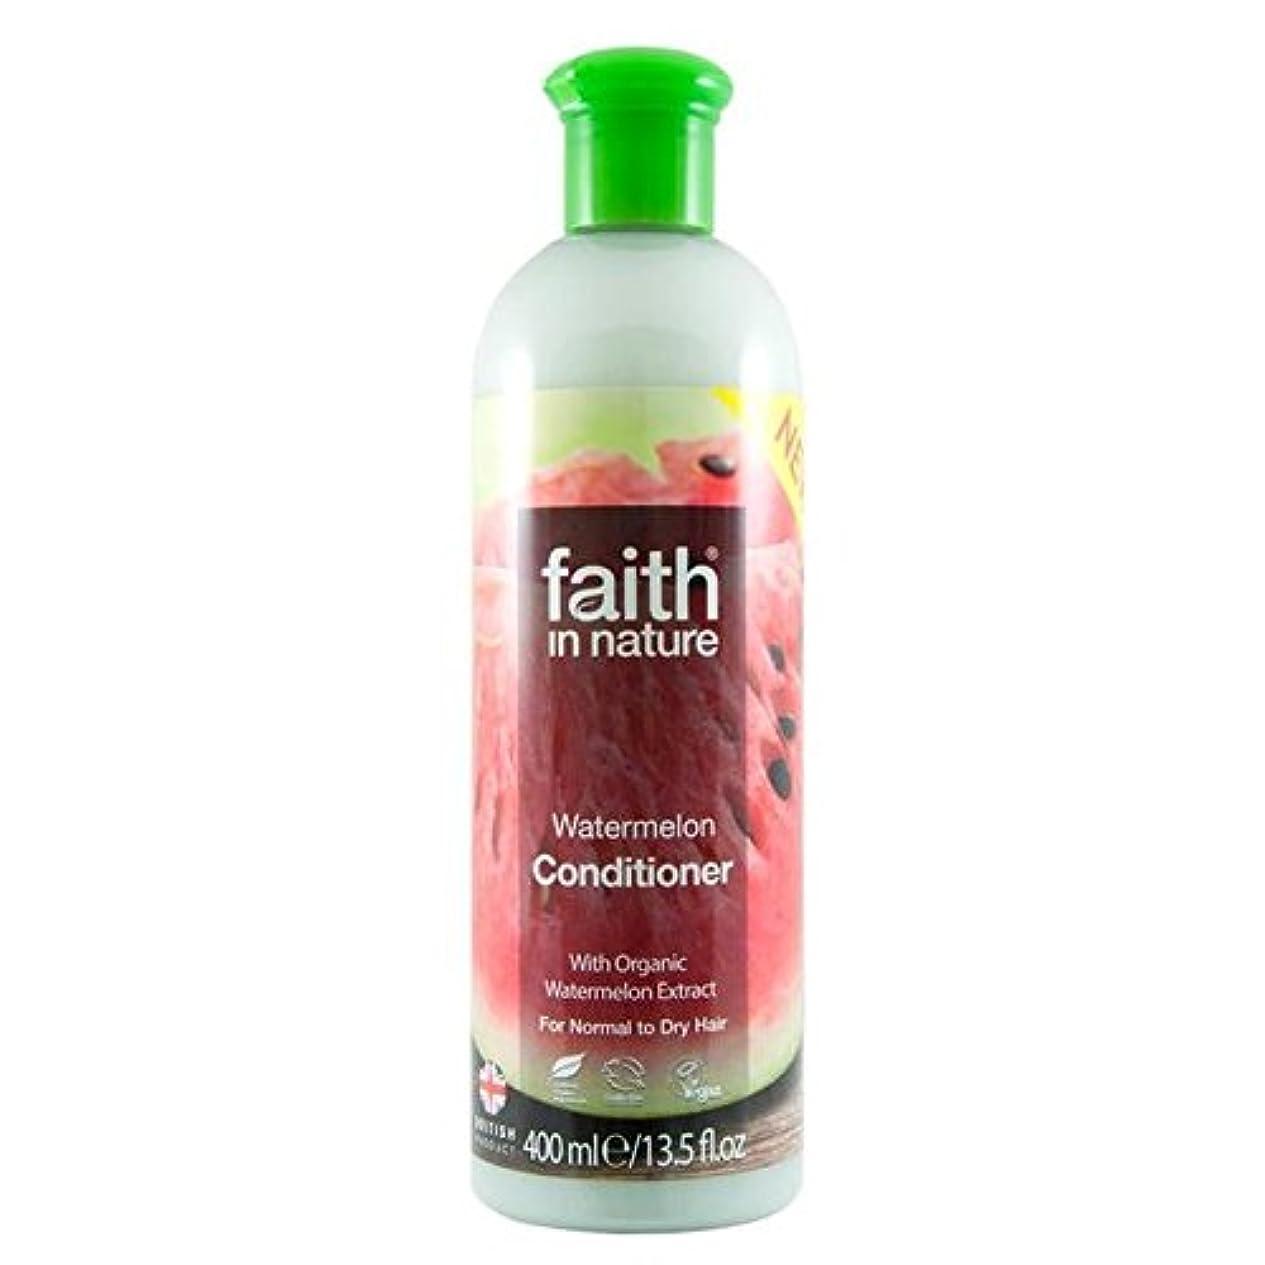 Faith in Nature Watermelon Conditioner 400ml (Pack of 2) - (Faith In Nature) 自然スイカコンディショナー400ミリリットルの信仰 (x2) [並行輸入品]